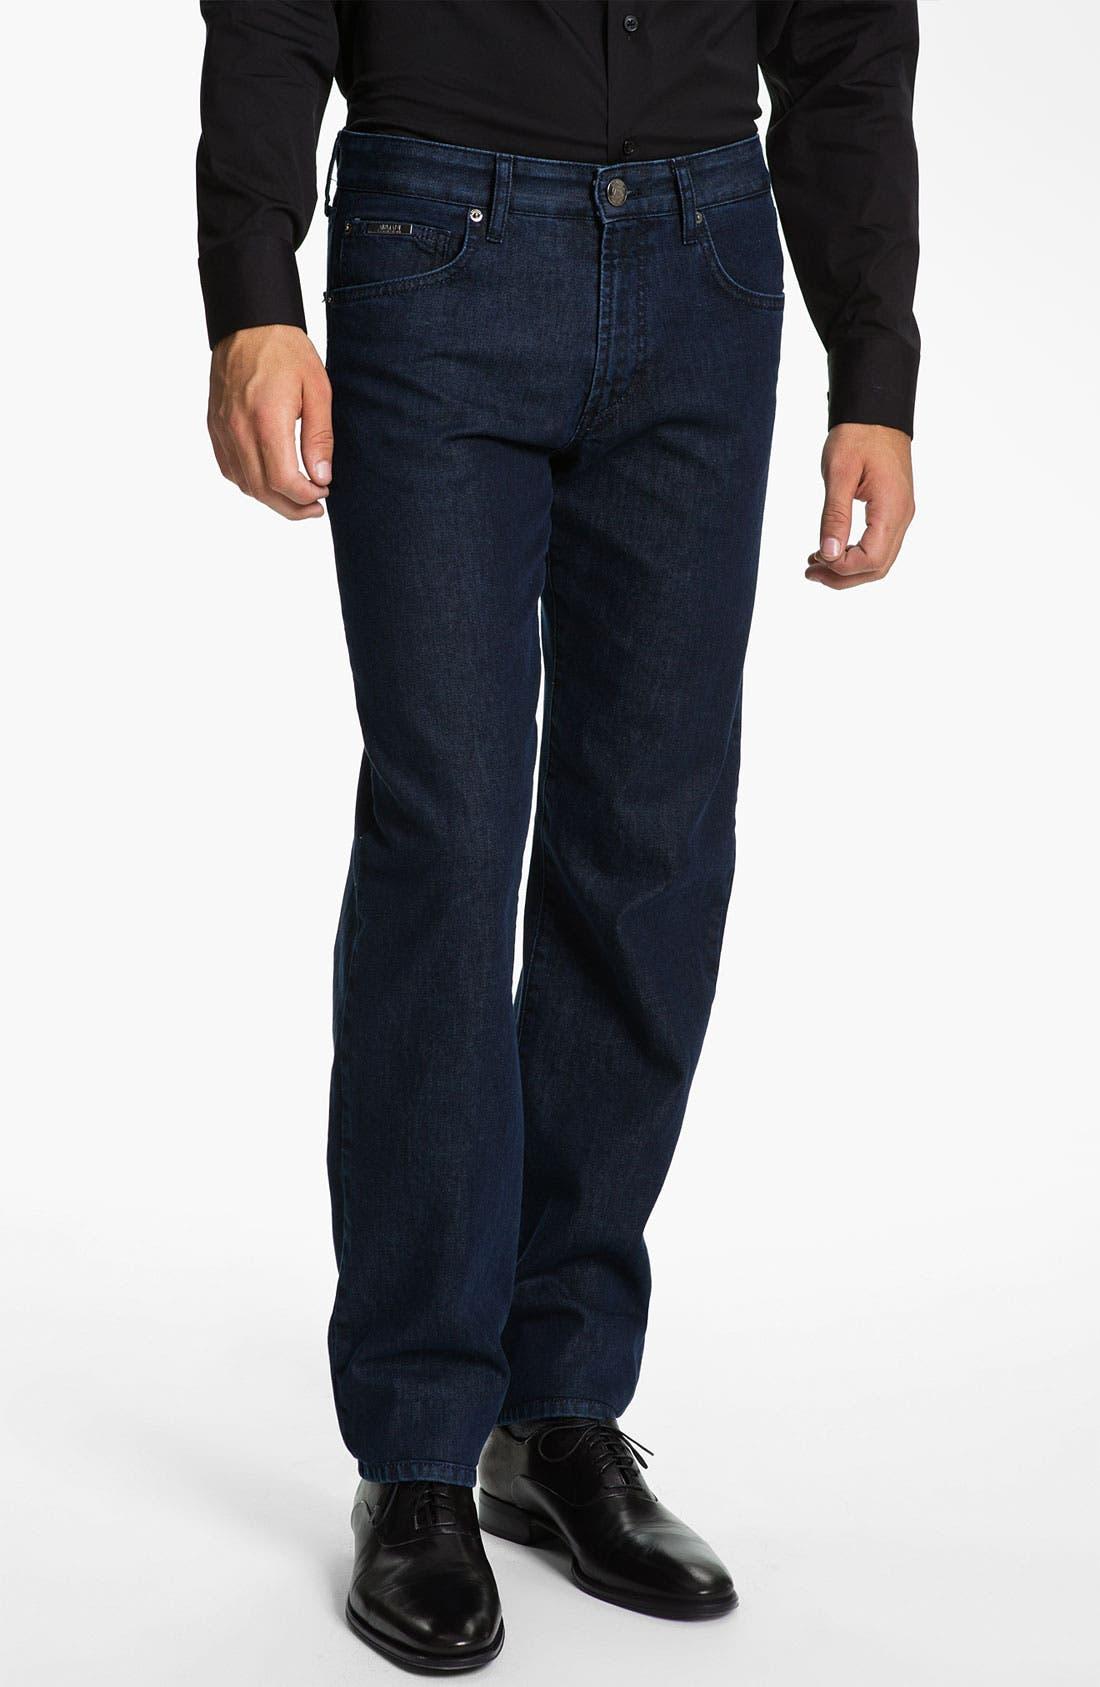 Main Image - Armani Collezioni Straight Leg Jeans (Navy Wash)